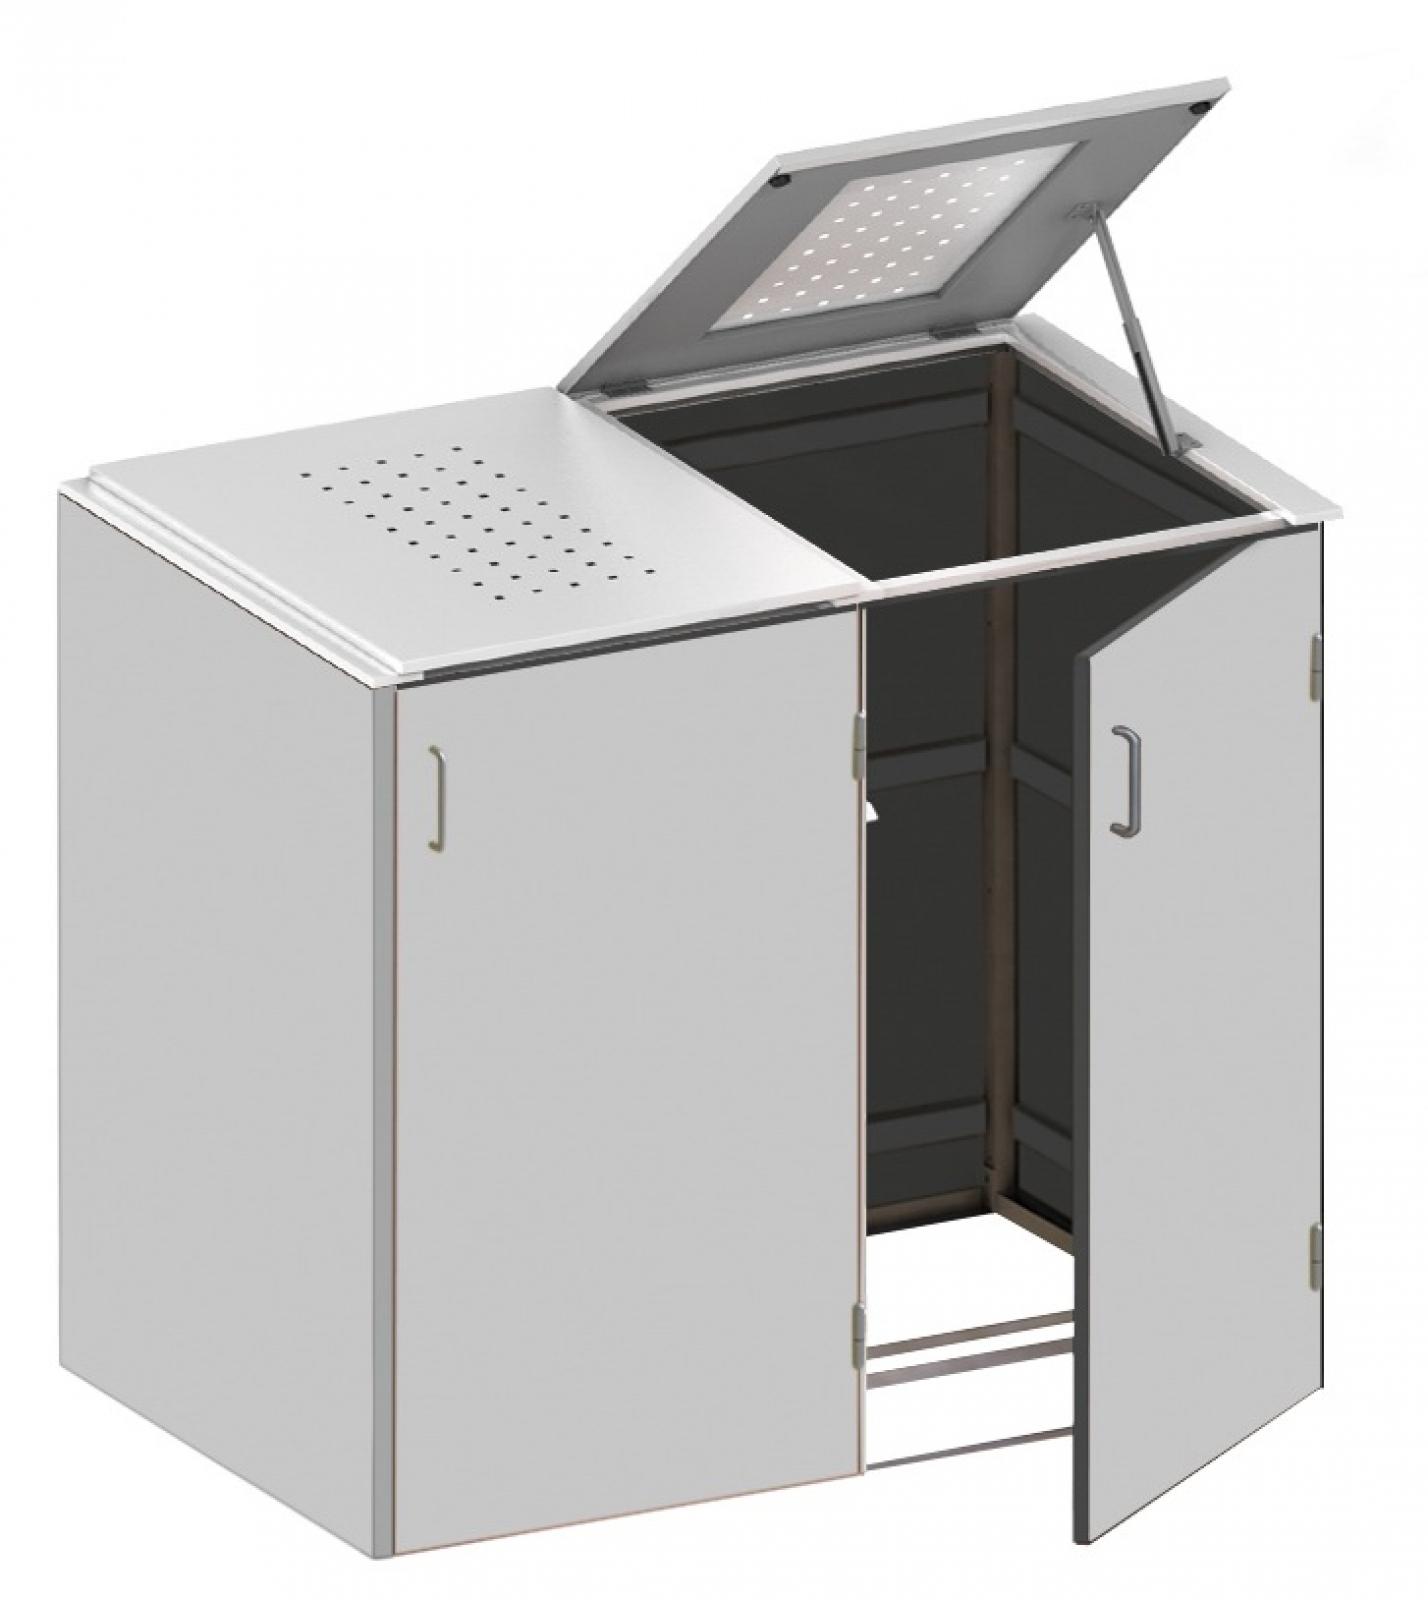 binto mülltonnenbox - hpl lichtgrau-edelstahl 2k